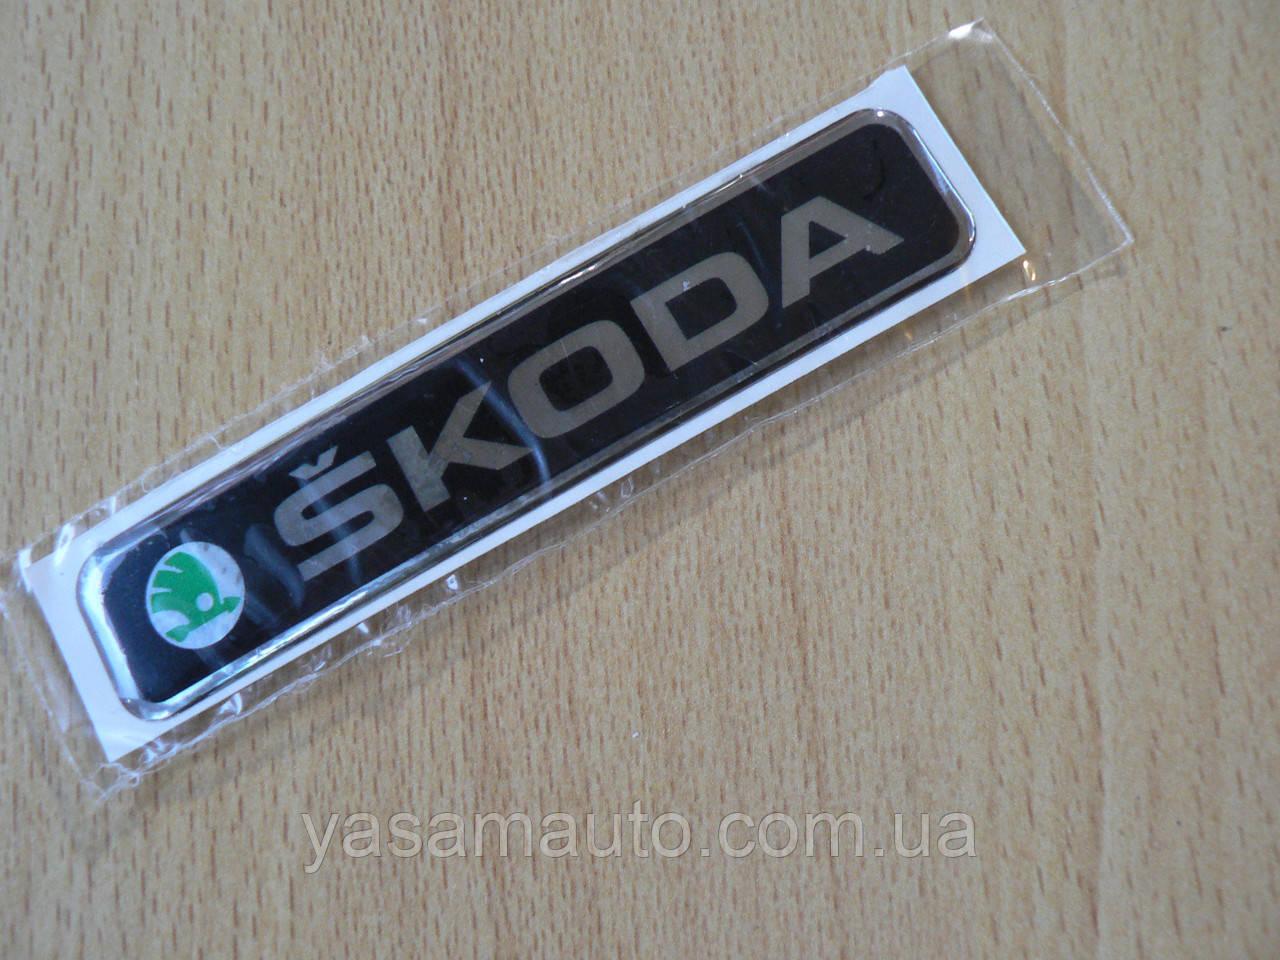 Наклейка s напис Skoda 100х20х1мм силіконова на авто емблема логотип Шкода зелена